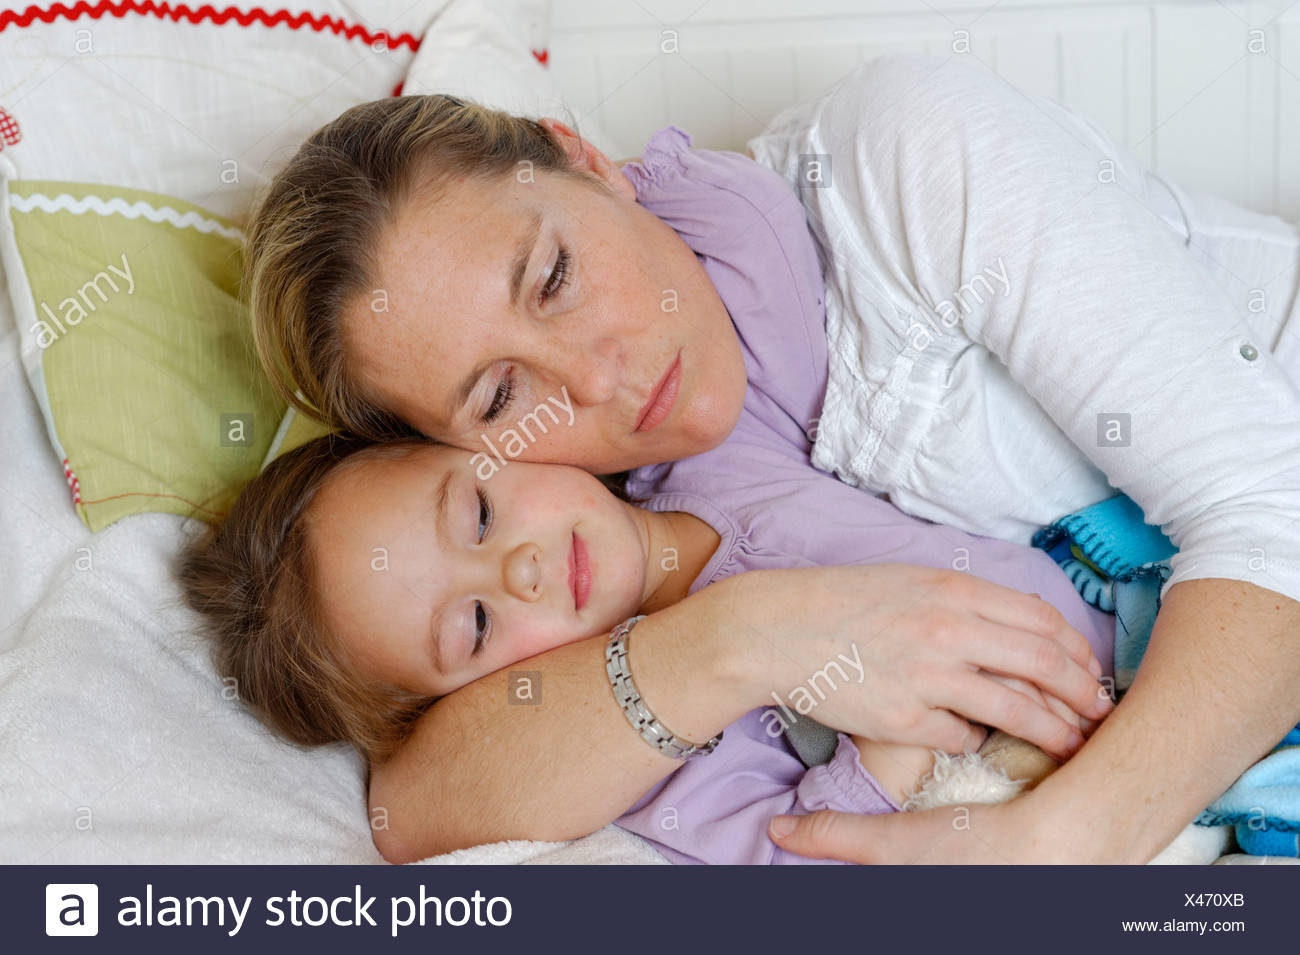 Madre e hija caricias en la cama, abrazando Imagen De Stock